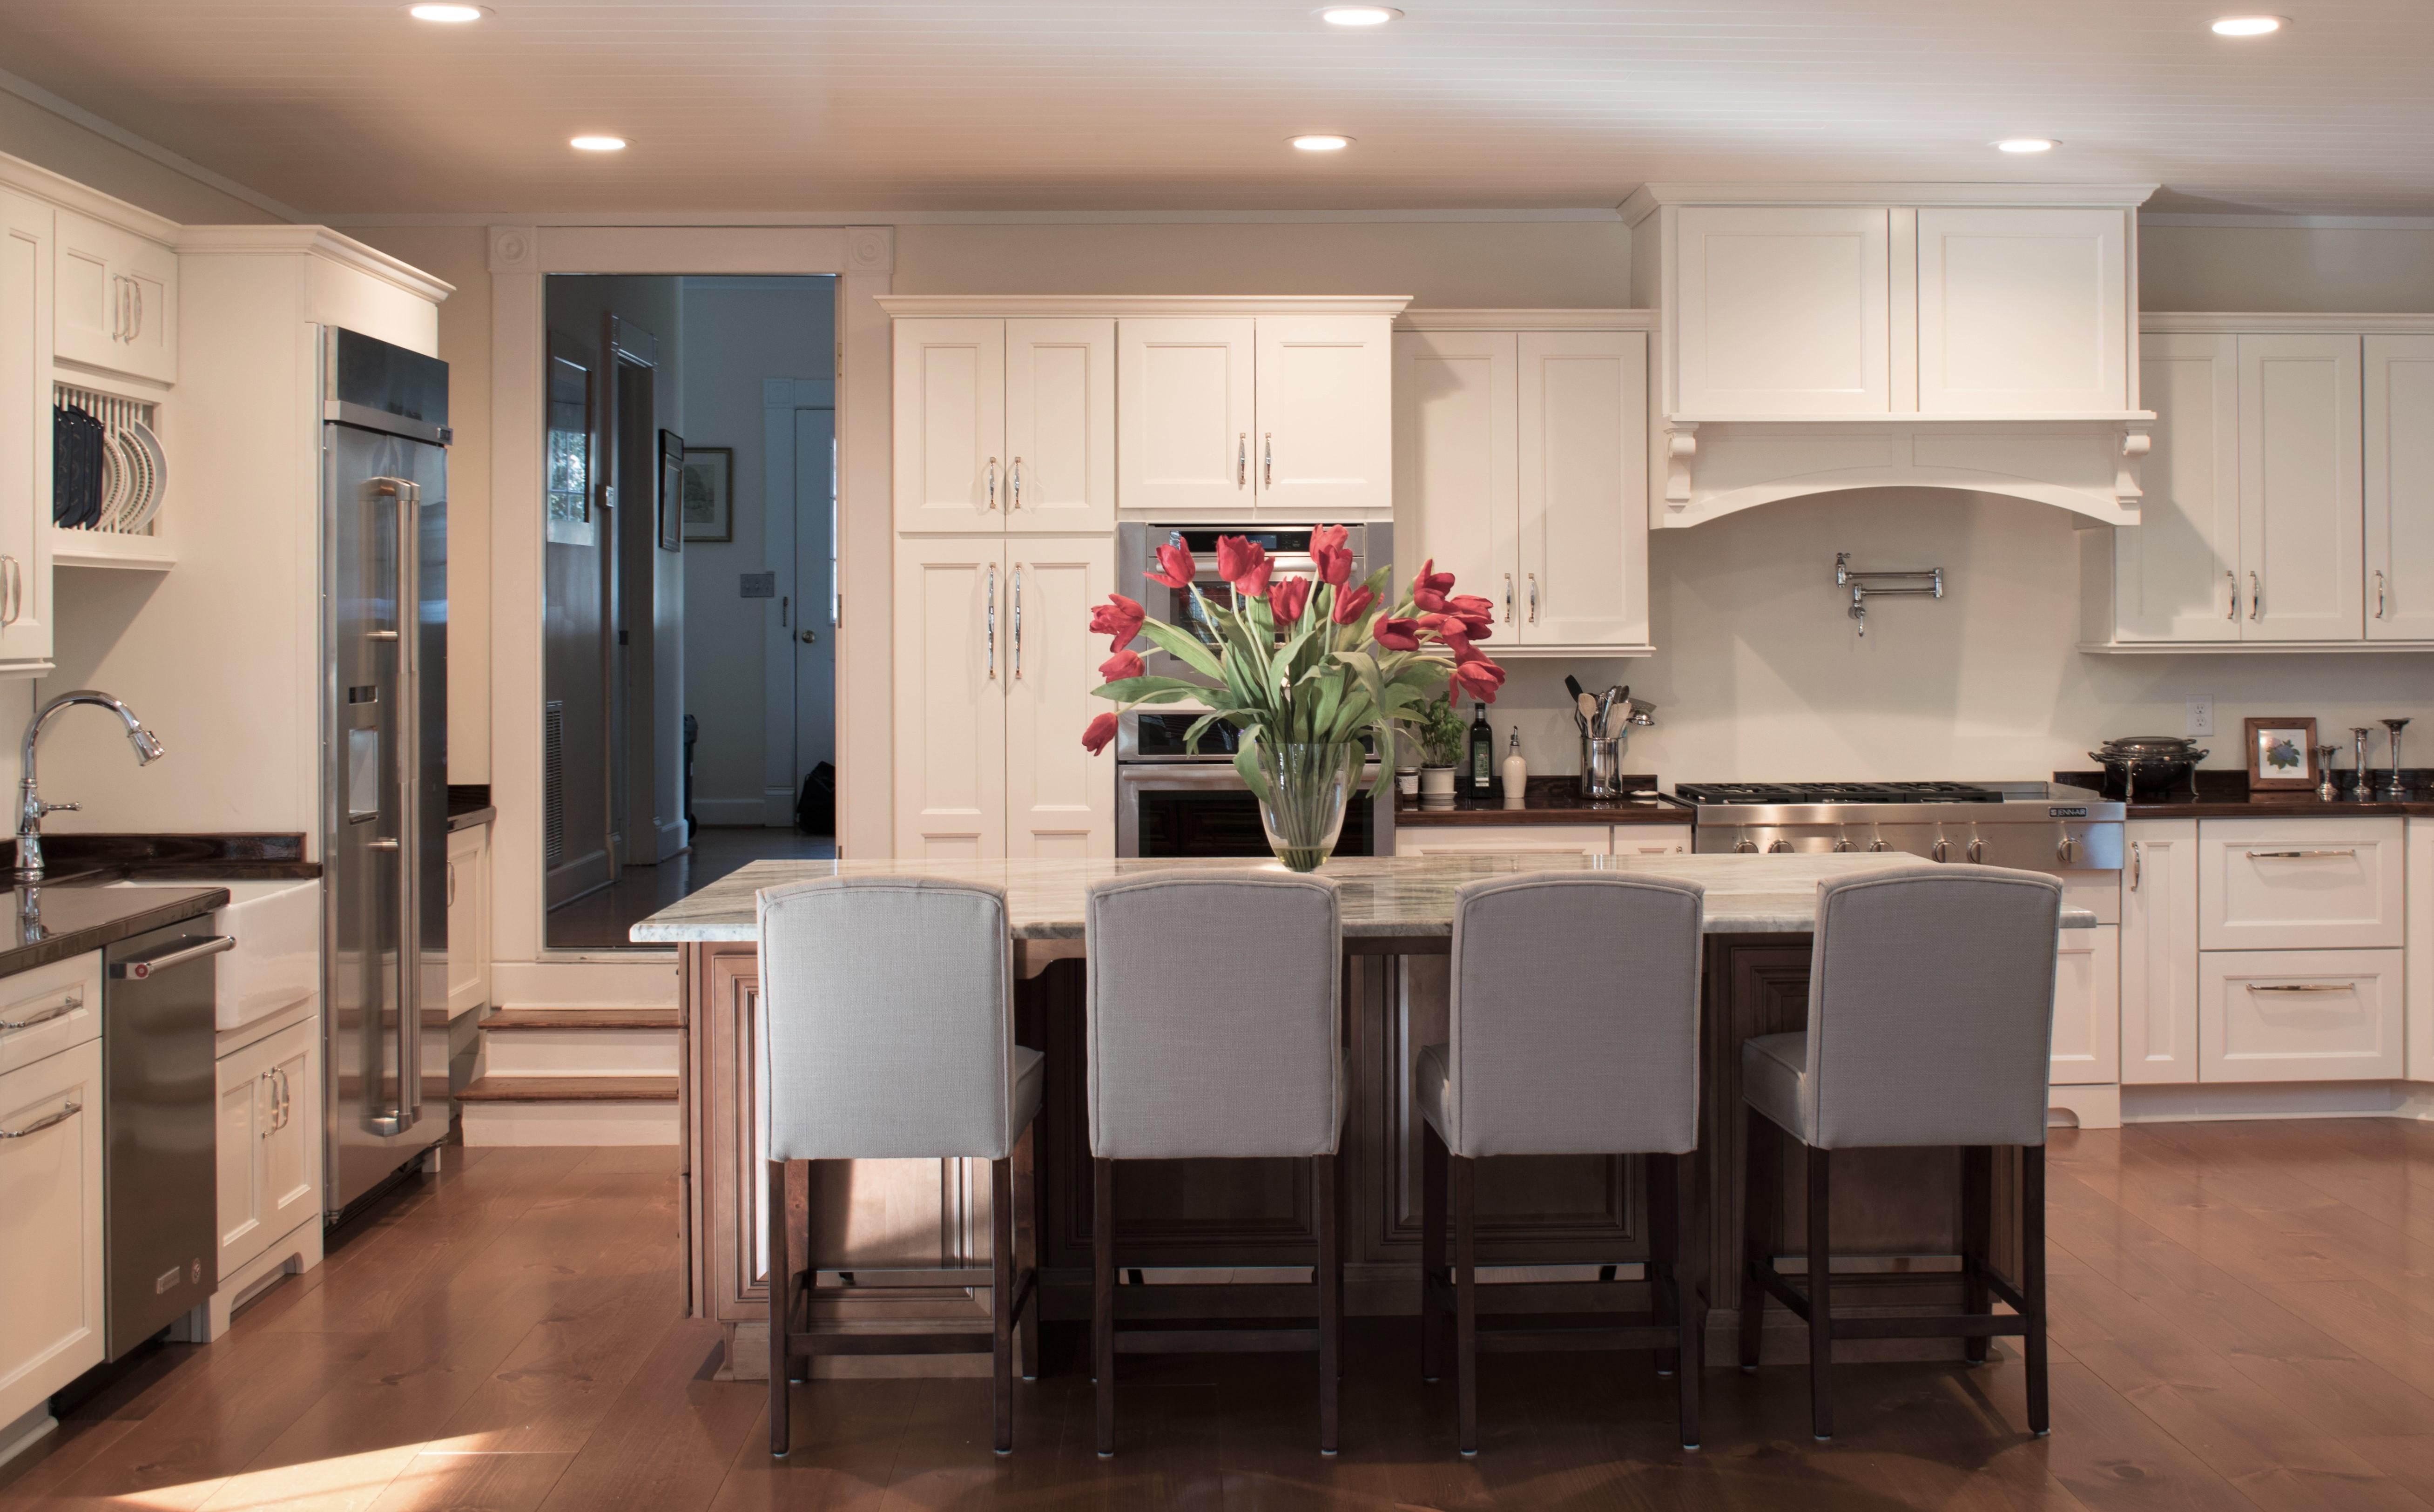 Cabinets Cabinetry Of Pinehurst United States